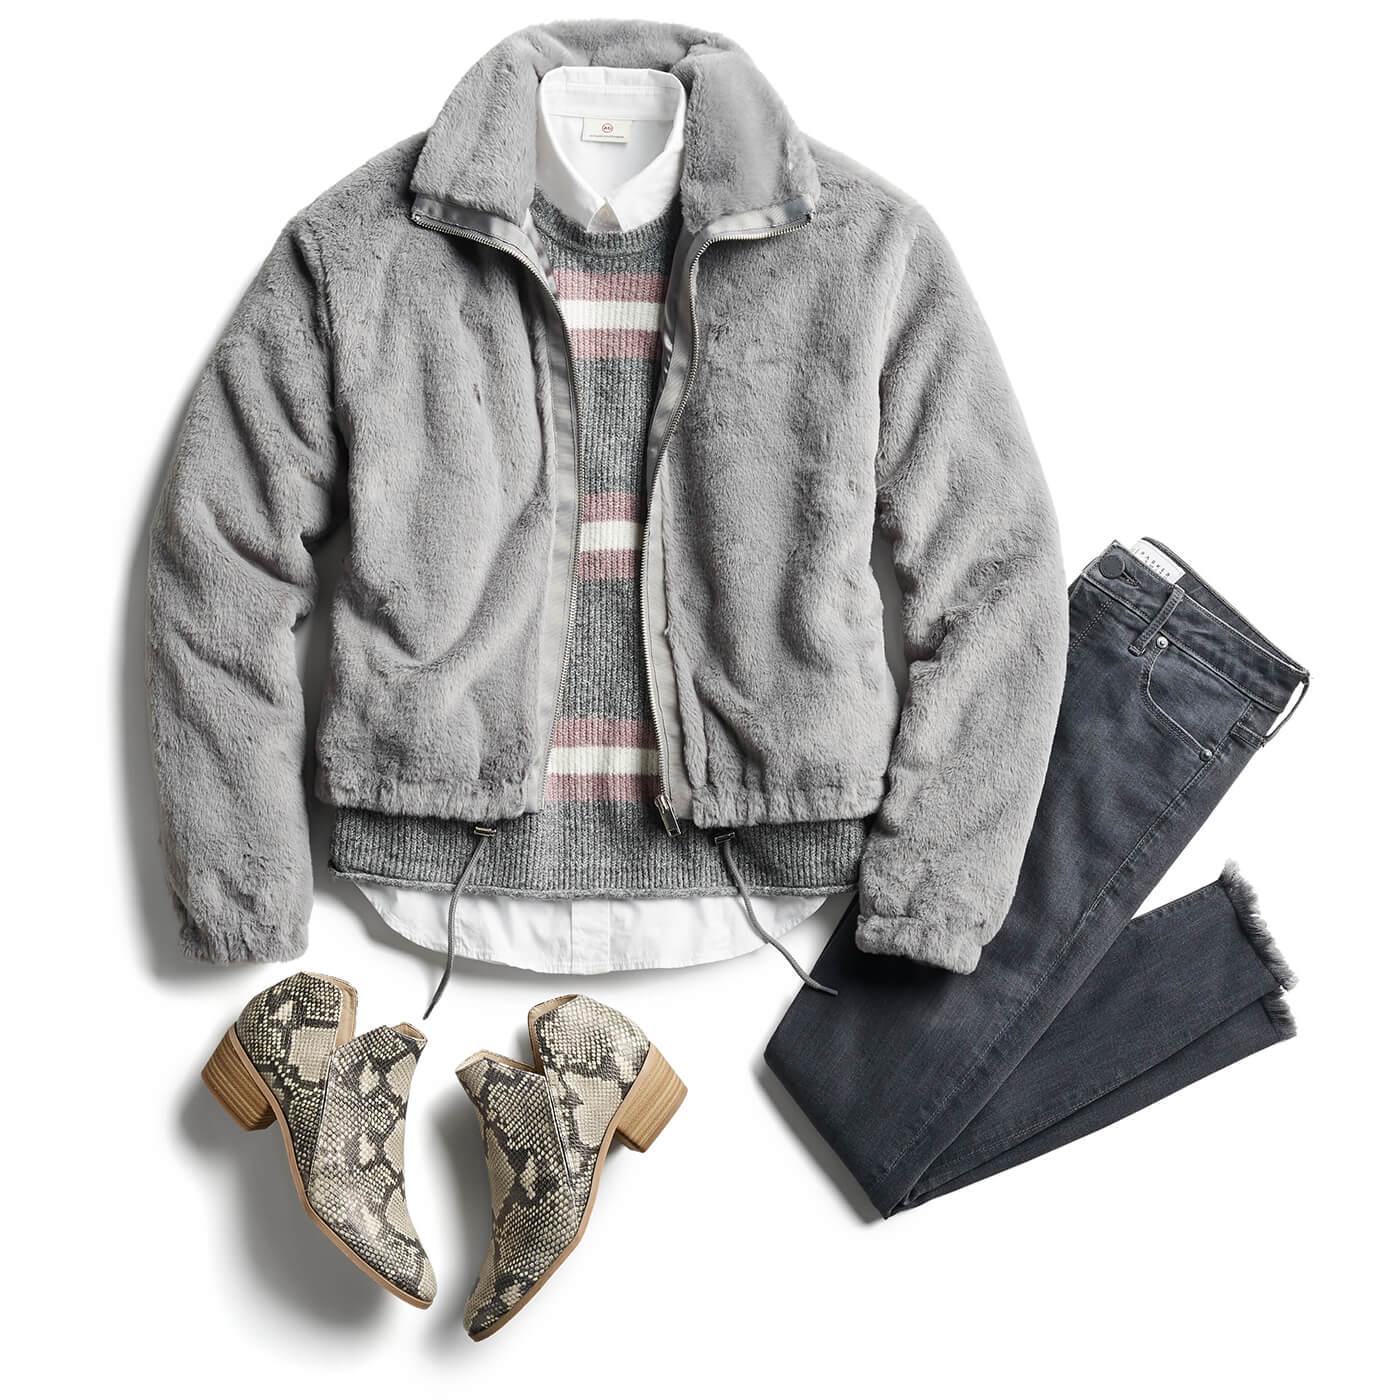 grey fleece jacket and grey jeans